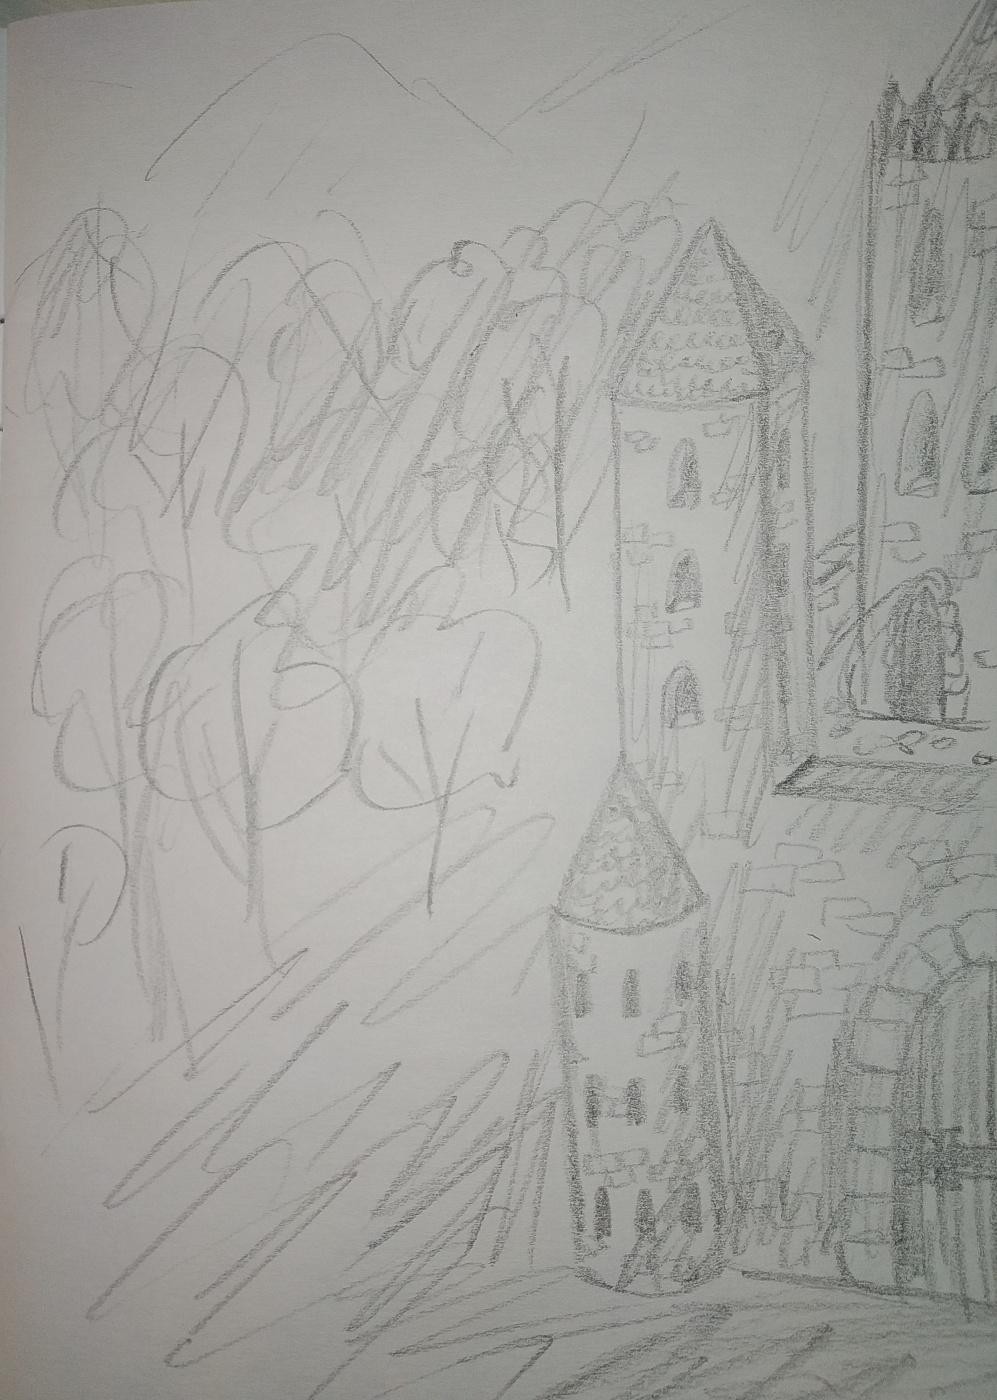 Zina Vladimirovna Parisva. The old castle and the area around it